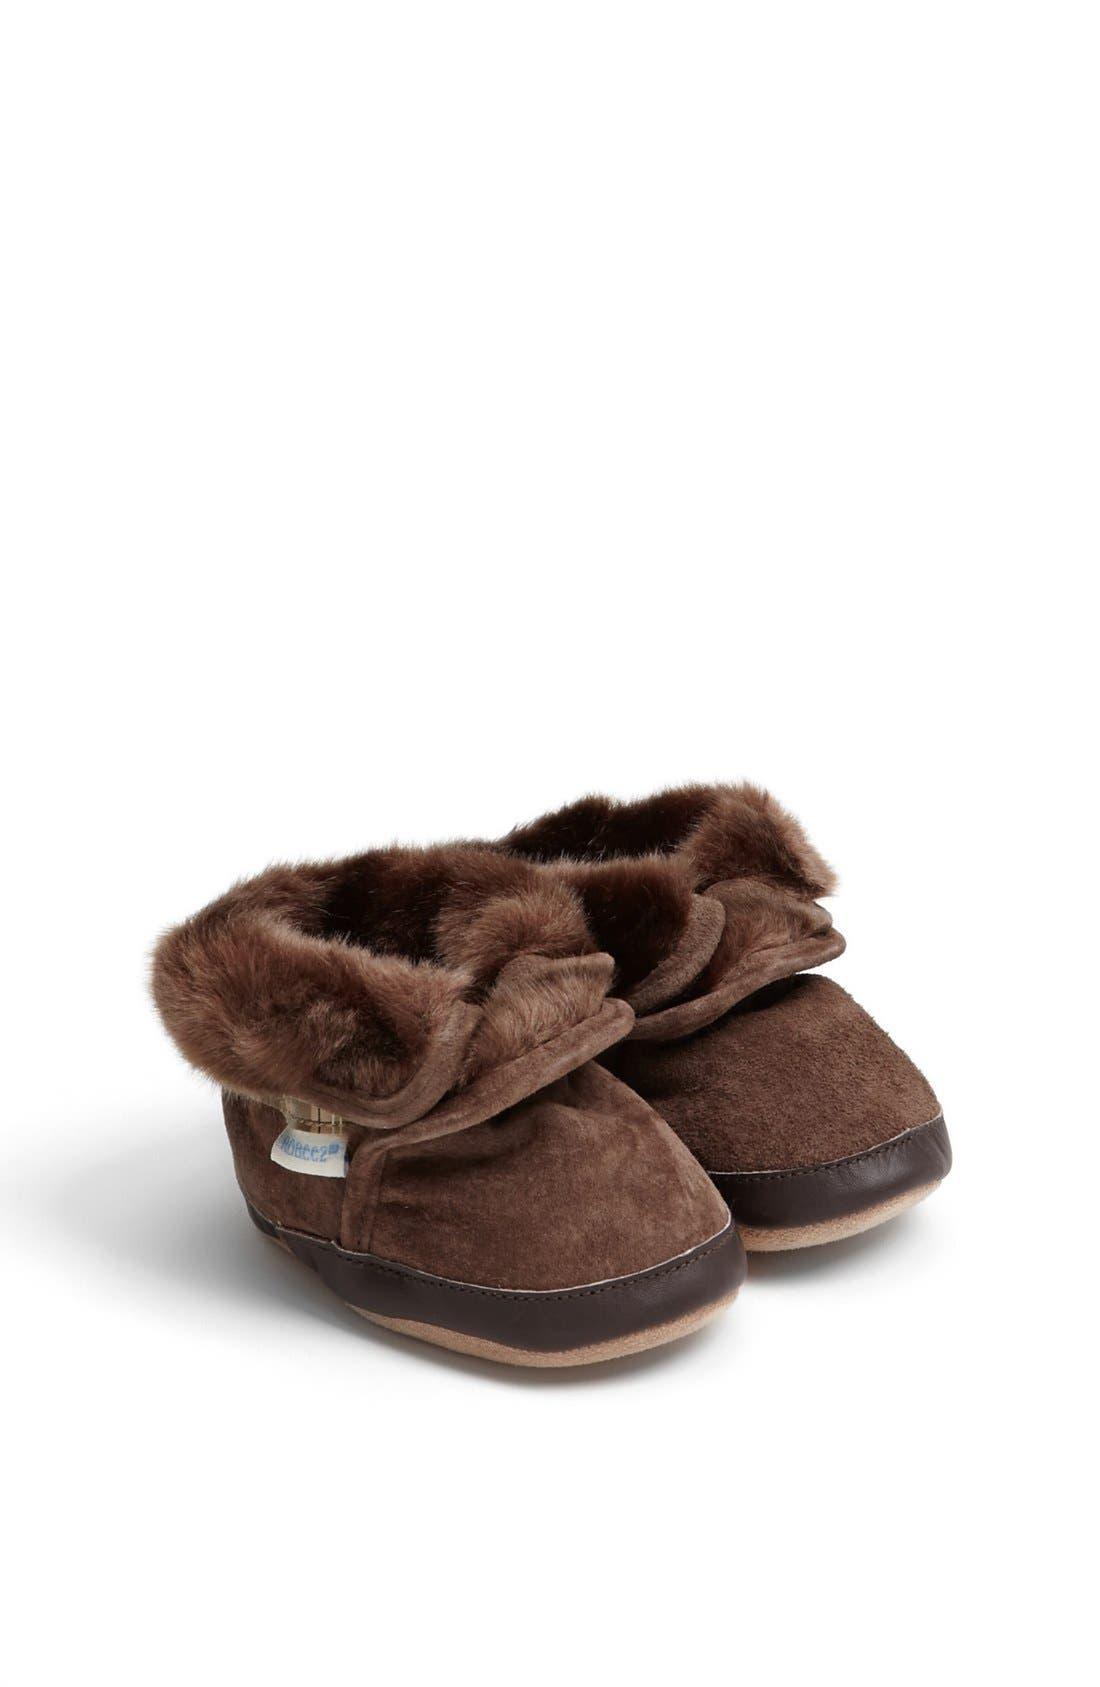 'Cozy' Ankle Bootie,                         Main,                         color, BROWN